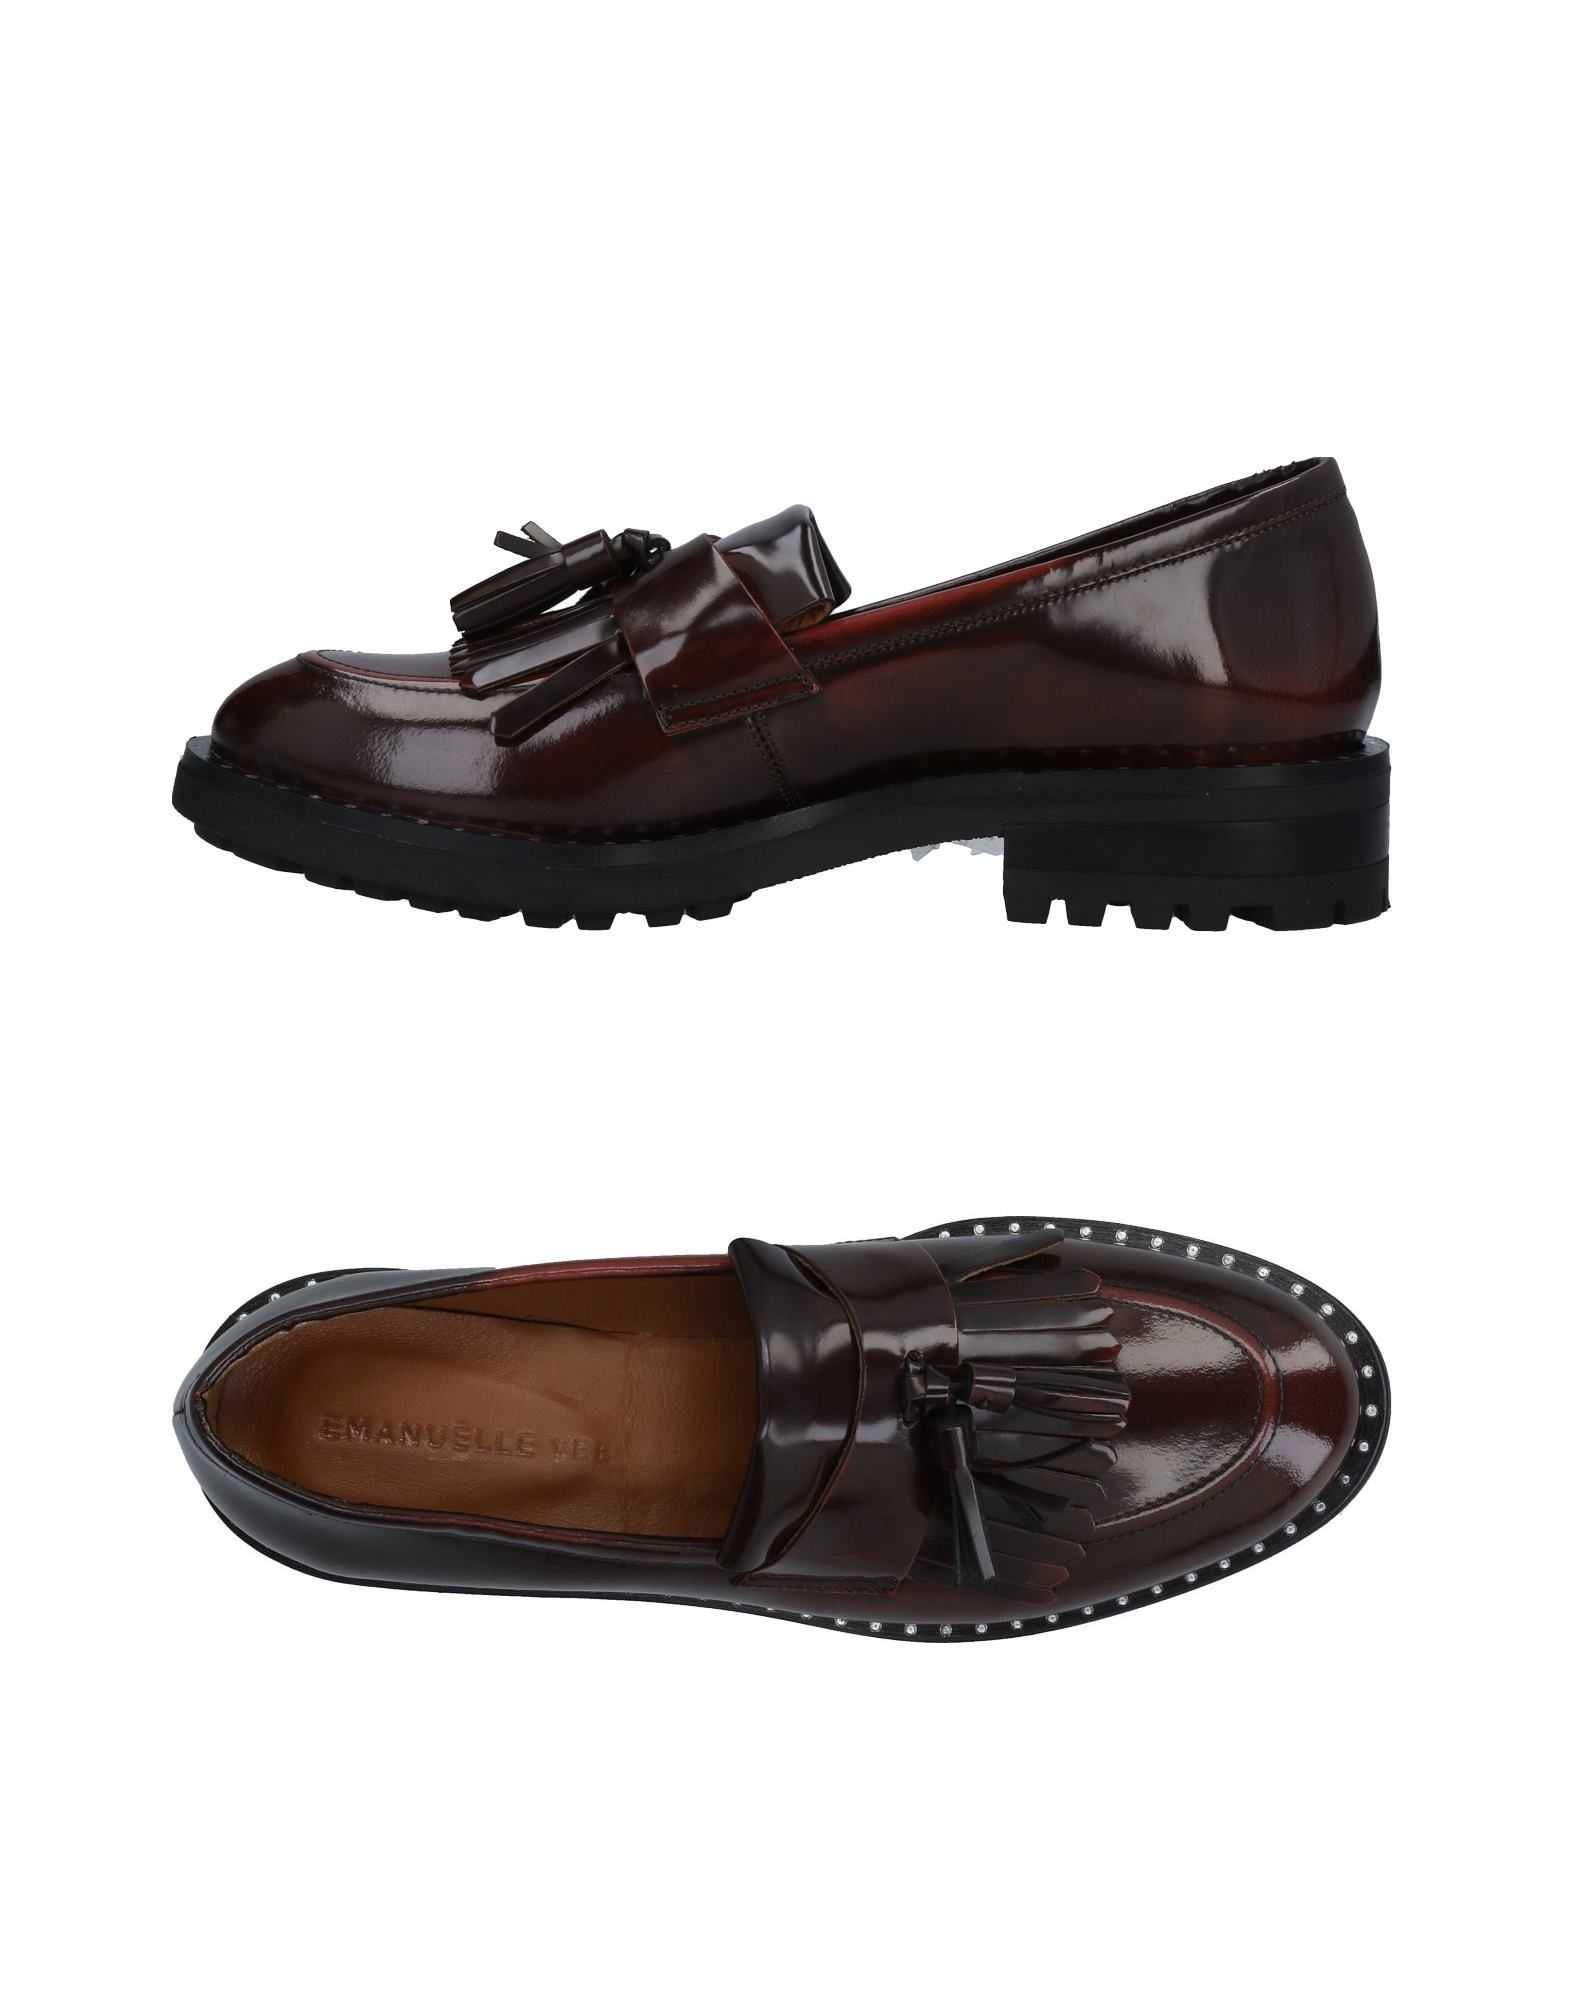 Emanuélle Vee Mokassins Damen  11490616VH Gute Qualität beliebte Schuhe